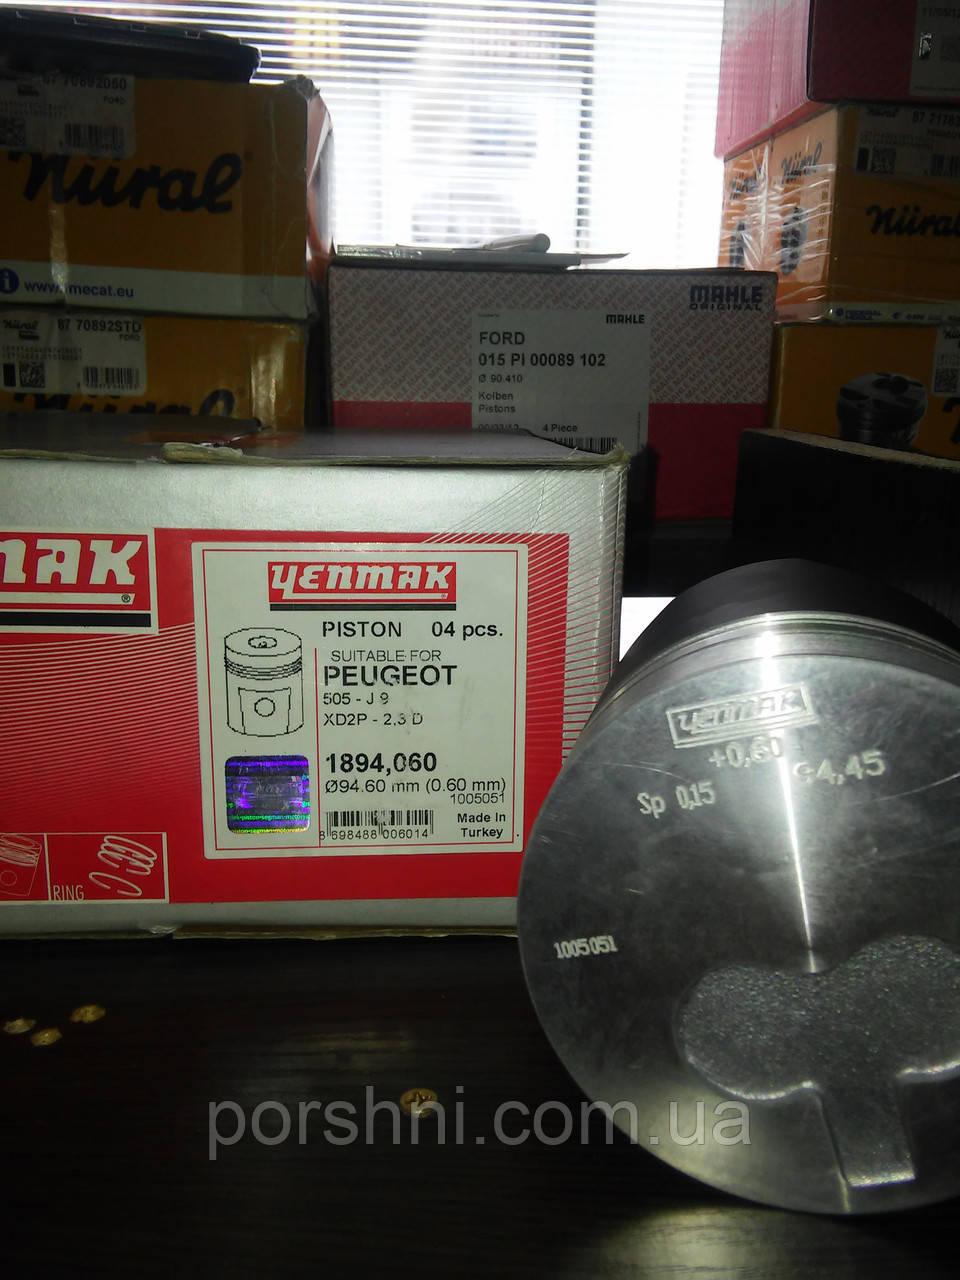 Поршневая  94 + 0,6  Sierra 2,3 D     ENMAK  1894060  без колец